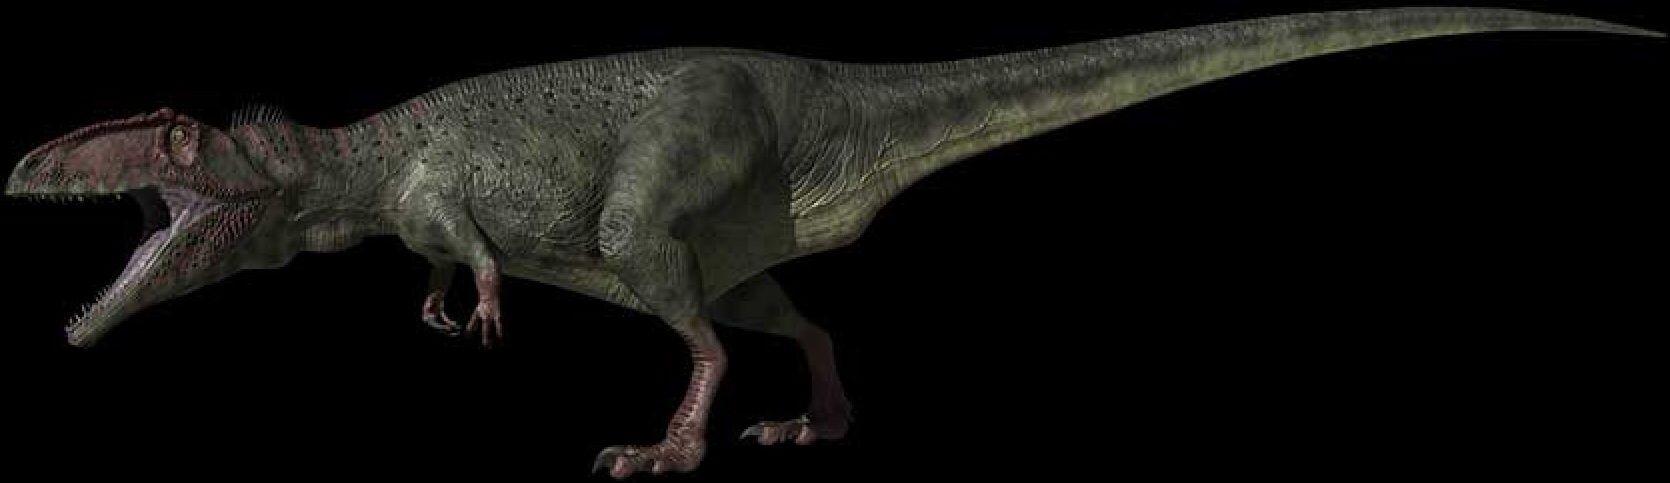 Giganotosaurus-Walking with Dinosaurs: Inside their World ...